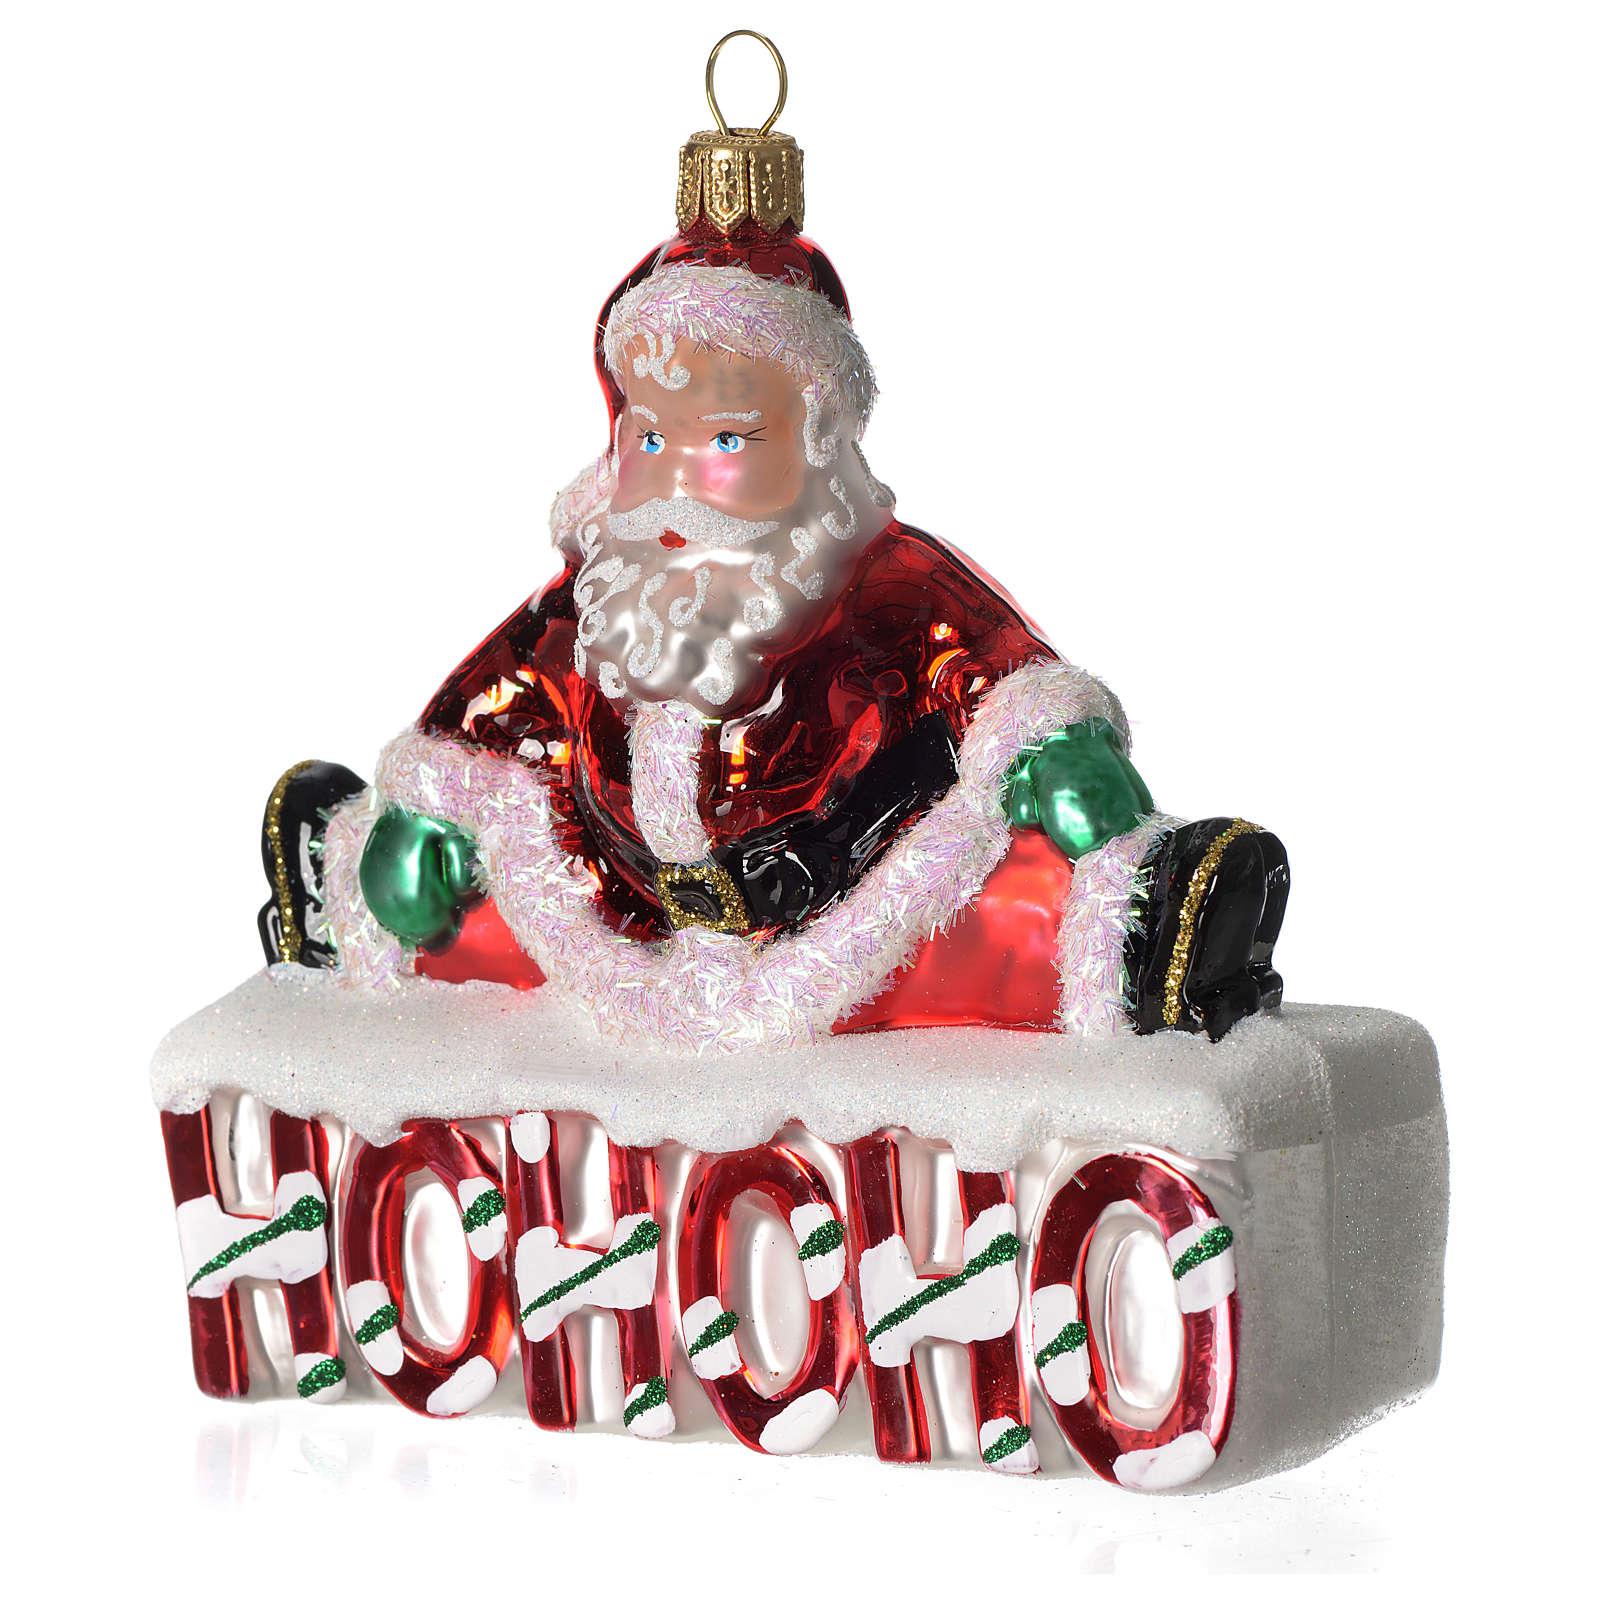 HOHOHO Papá Noel adorno vidrio soplado Árbol Navidad 4